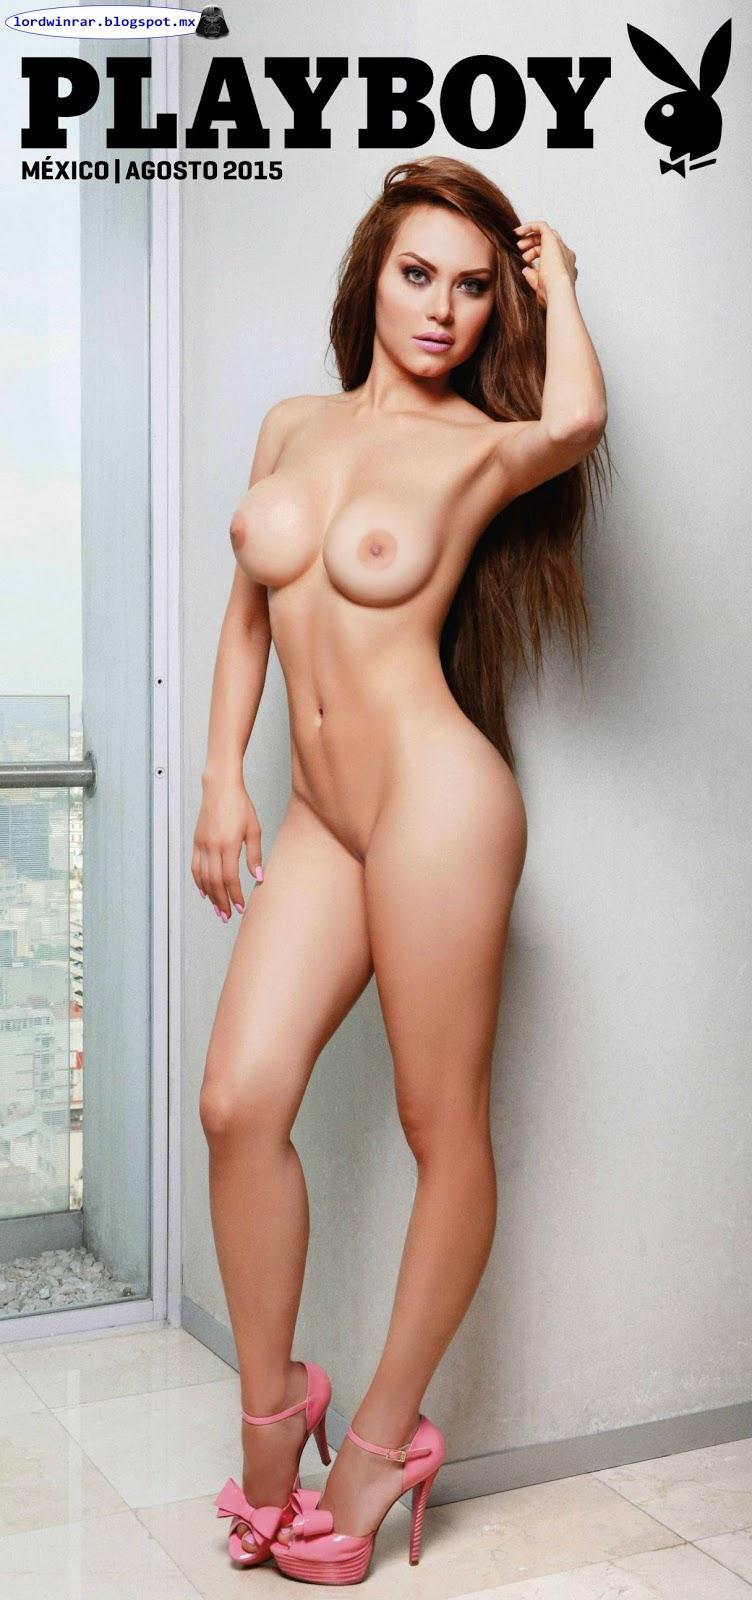 kim de guzman nude hot naked pictorial